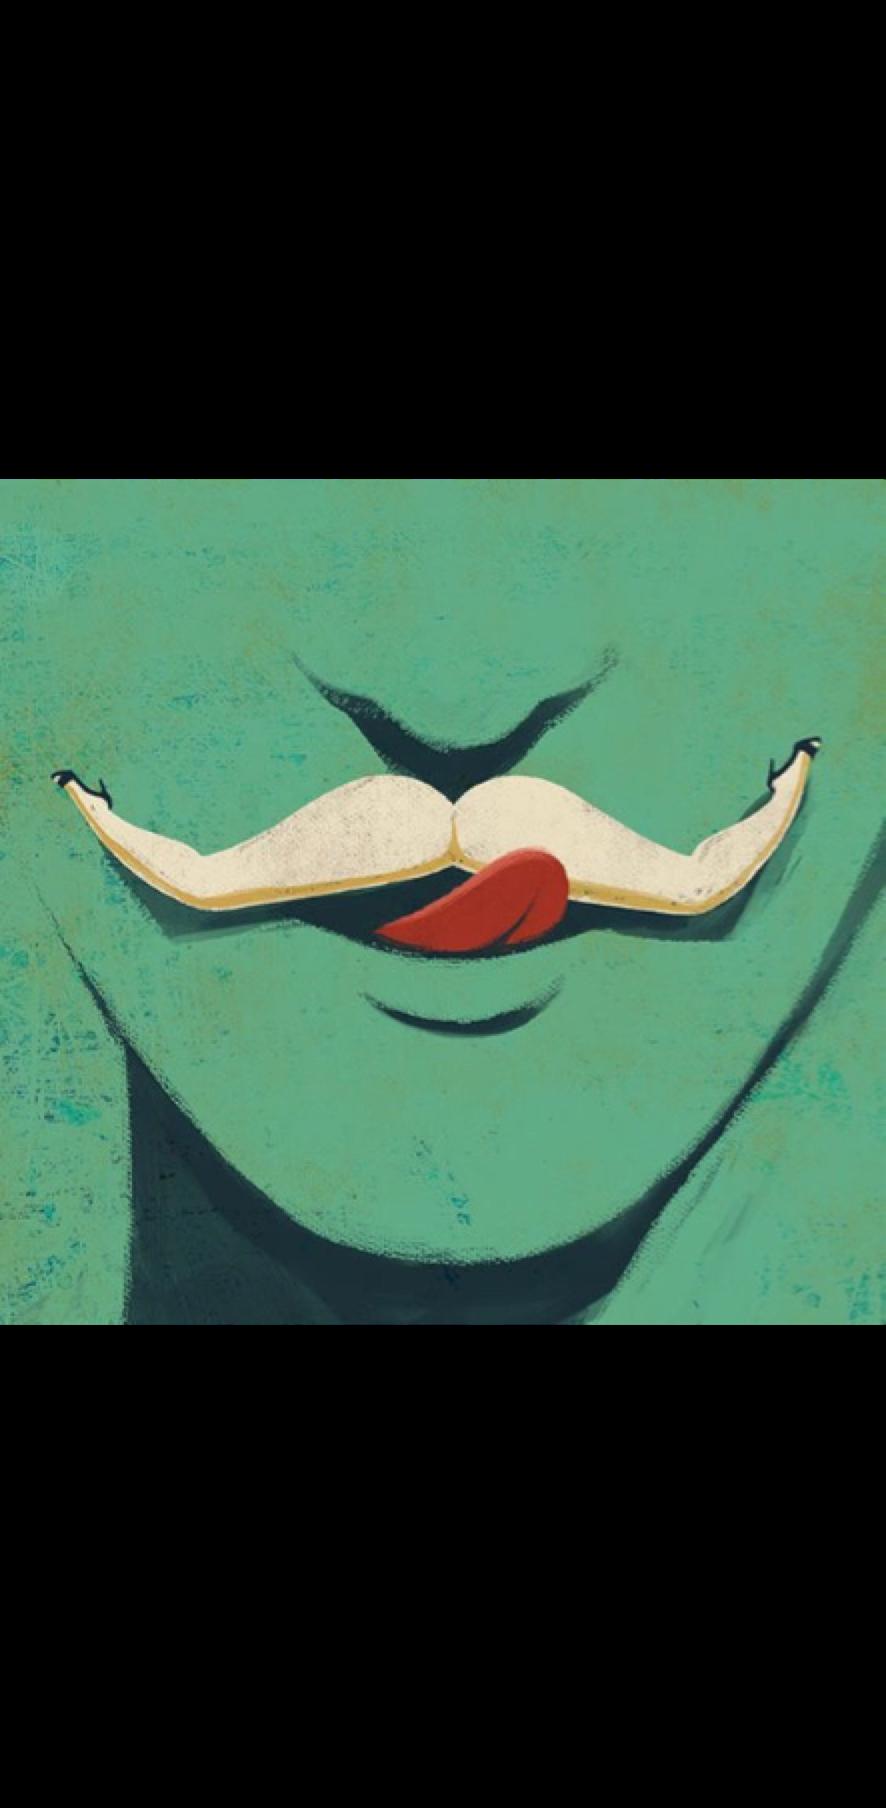 cover da leccarsi i baffi..